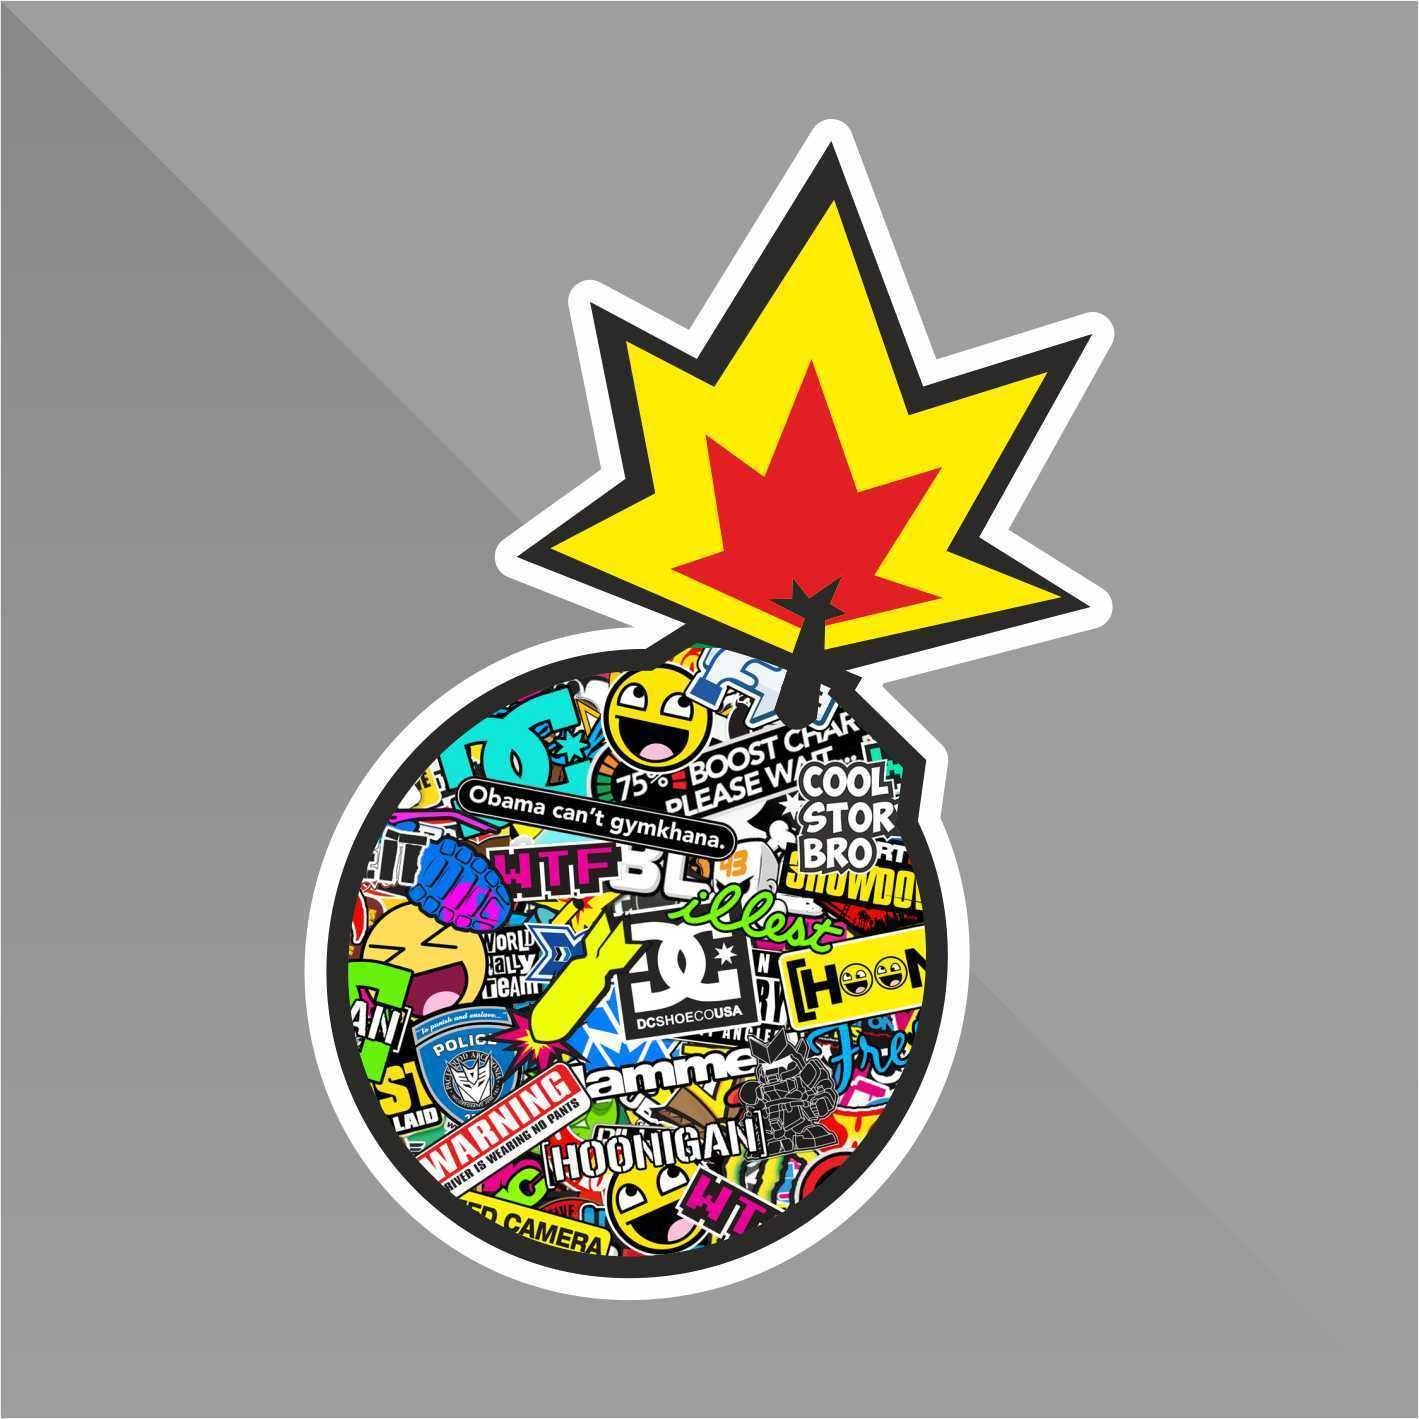 Sticker Bomb Teschio Skull Cr/âne Cr/áneo Sch/ädel Pistoni Pistons Punisher Decal Auto Moto Casco Wall Camper Bike Adesivo Adhesive Autocollant Pegatina Aufkleber cm 10